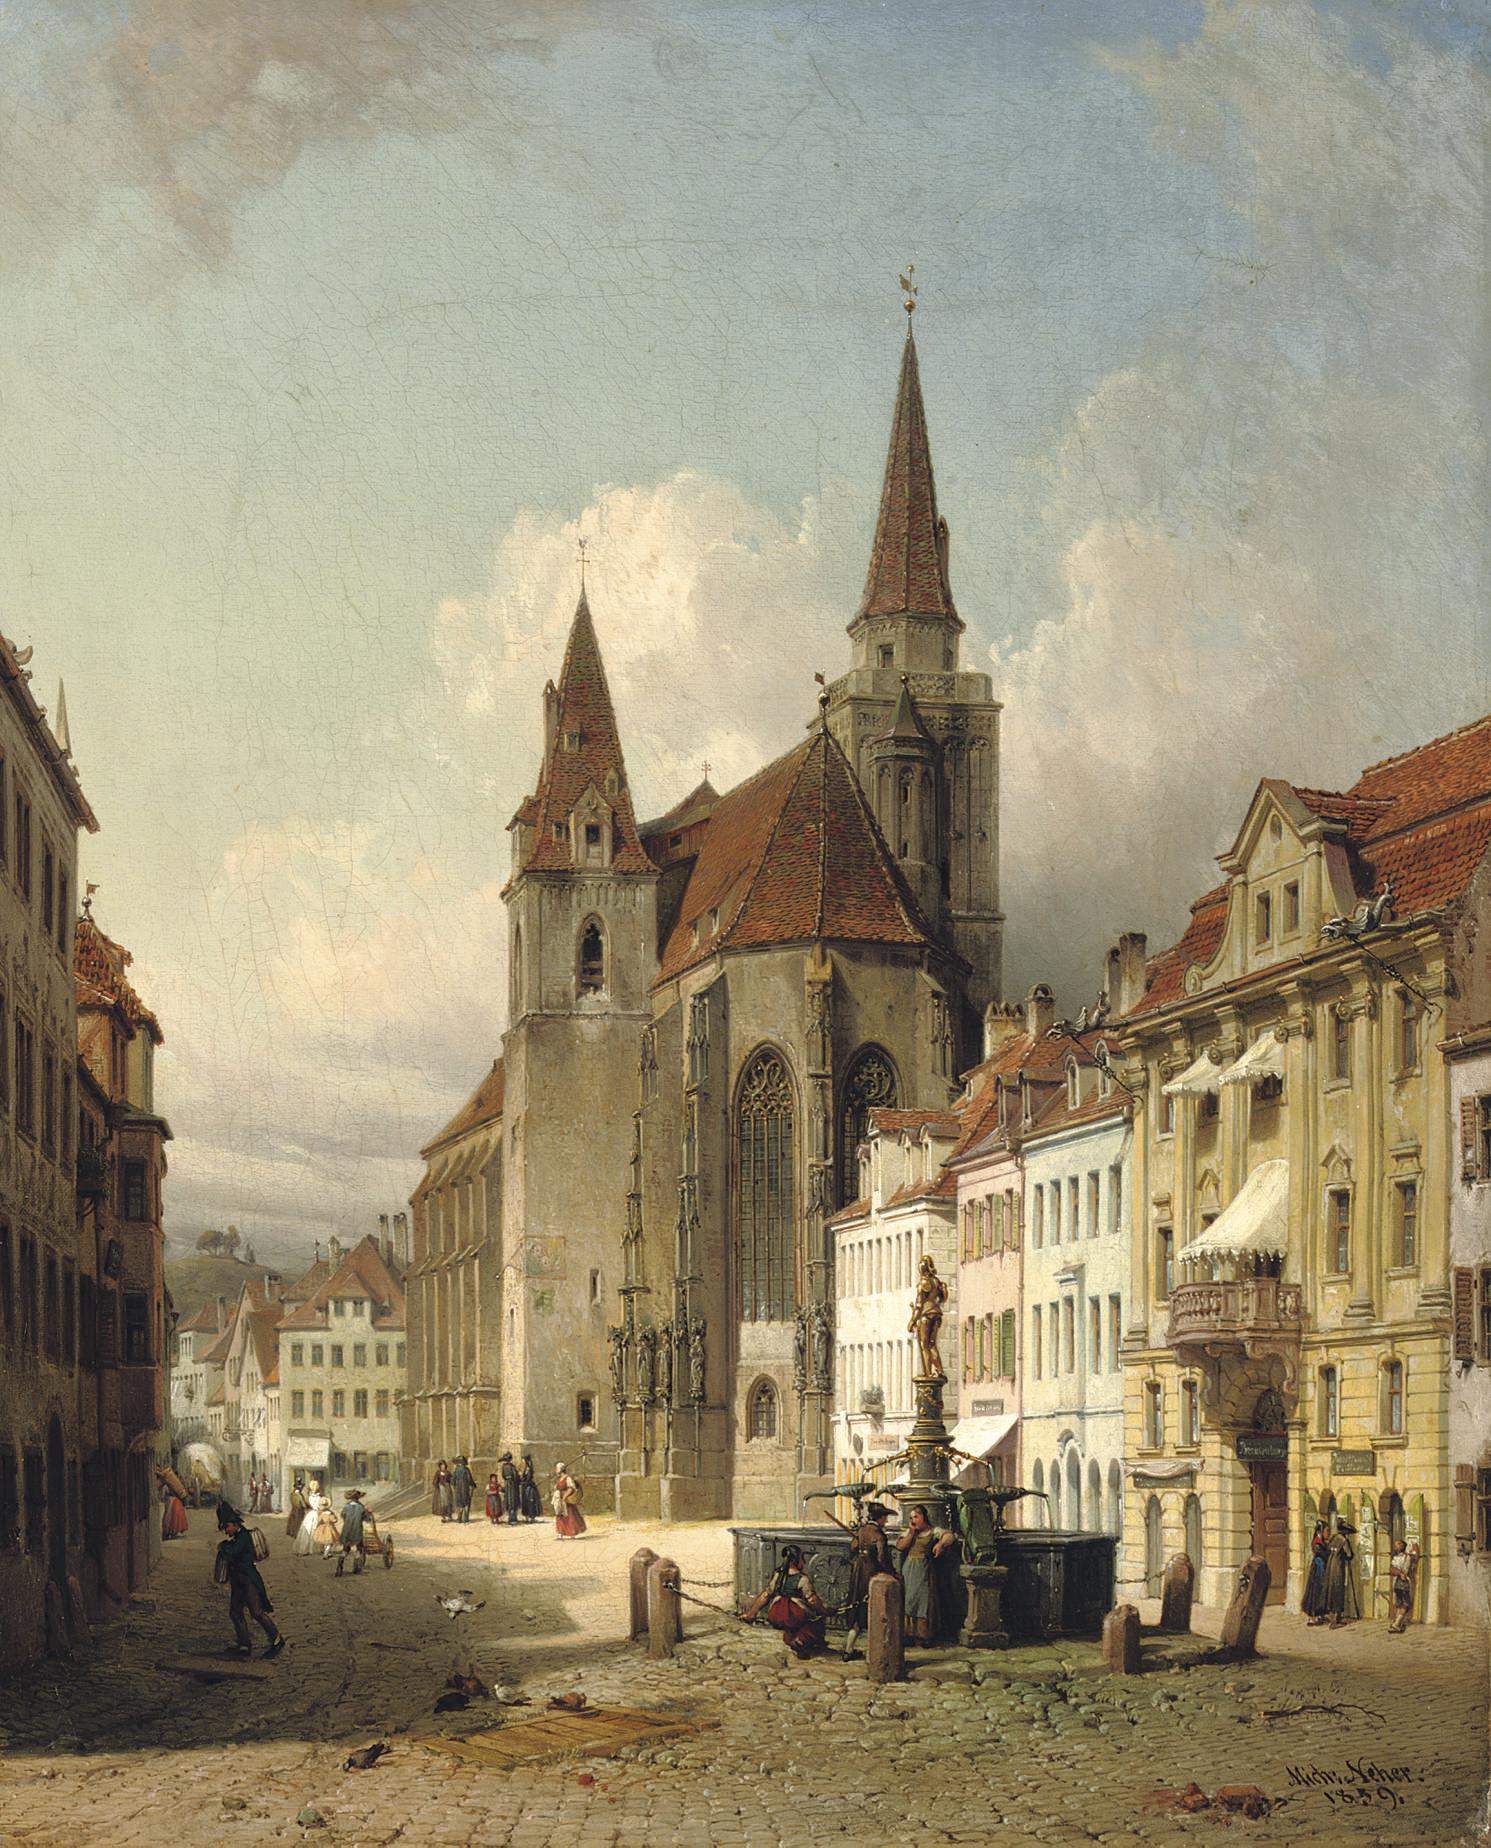 Michael Neher (German, 1798-18